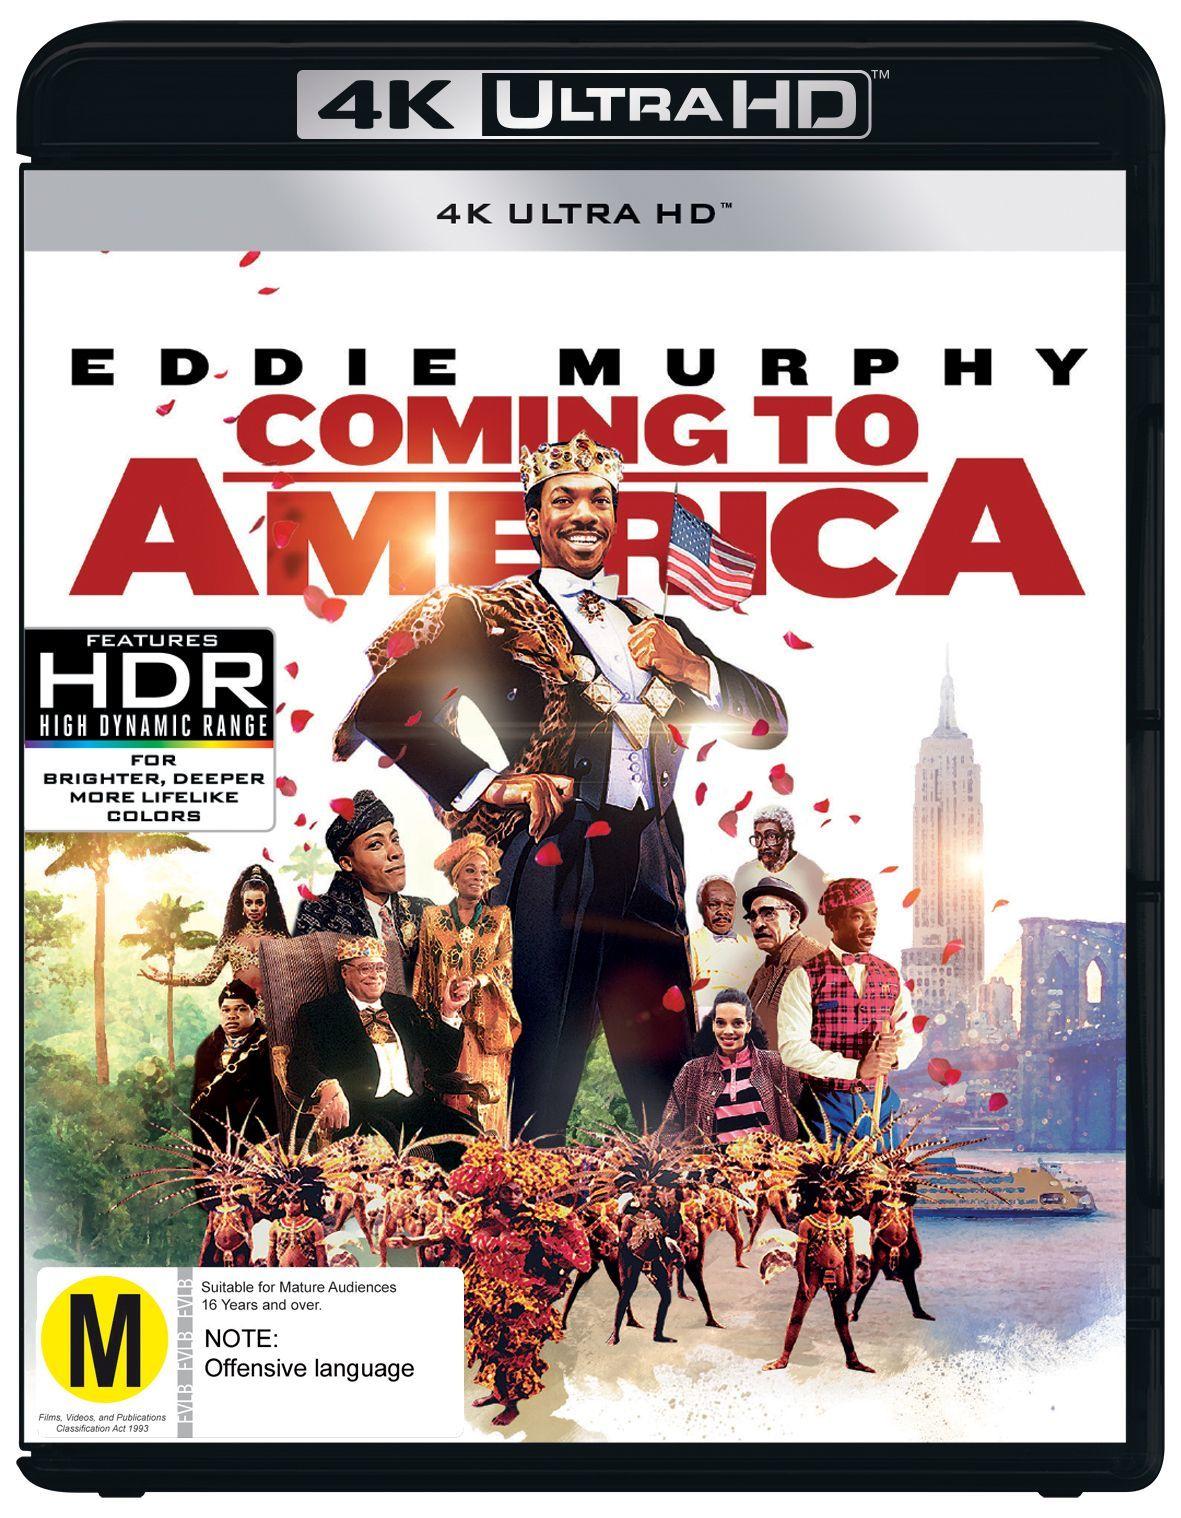 Coming To America (4K UHD) image